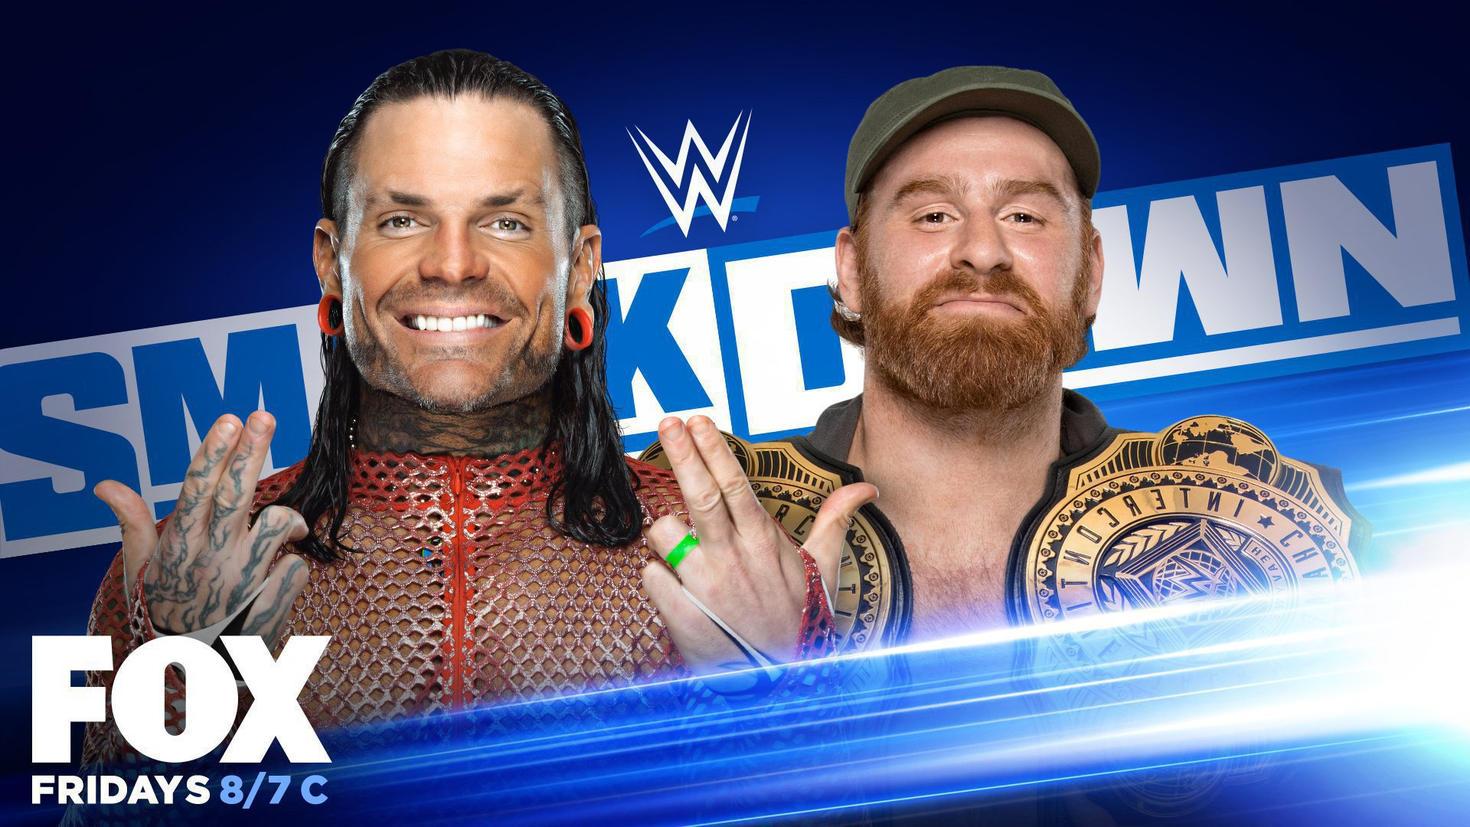 WWE Smackdown Preview (02/10/20): Roman Reigns; KO Show; Title Match 1